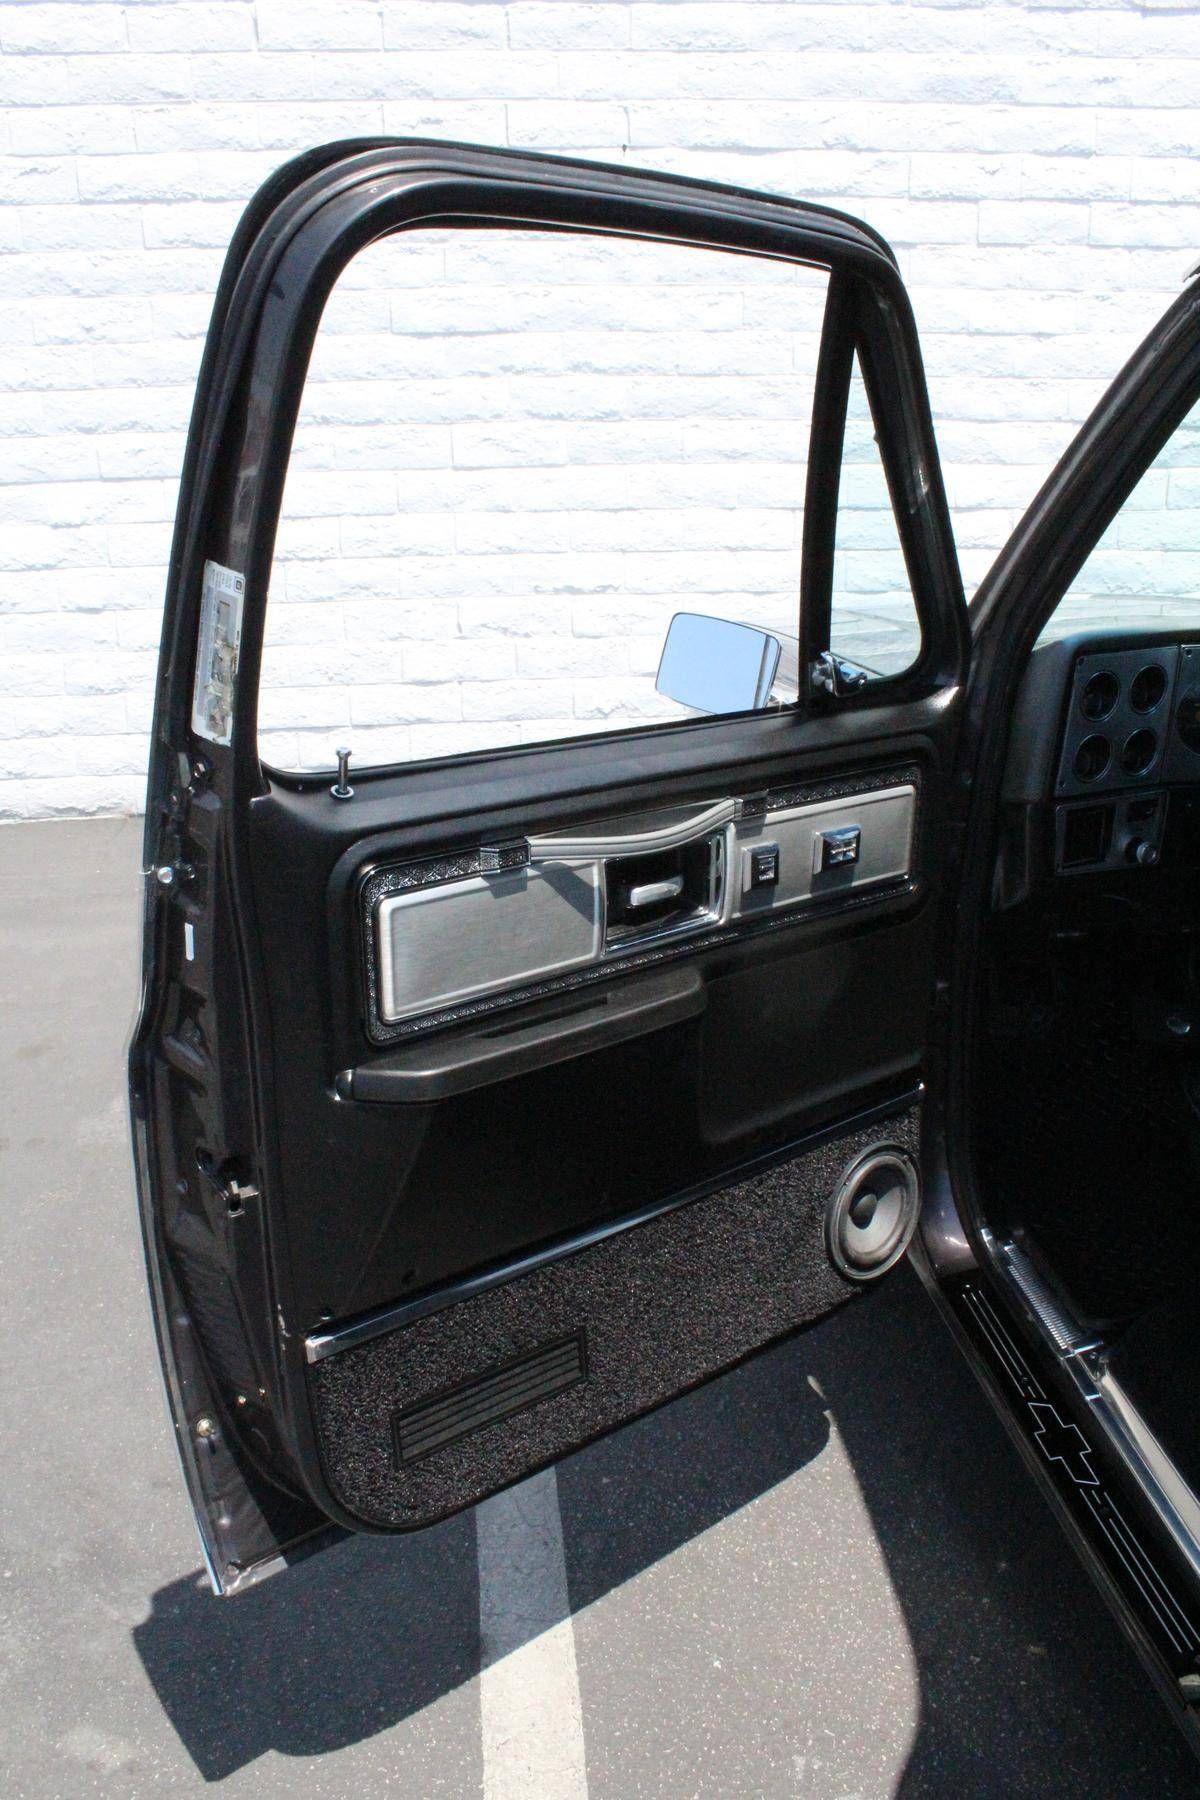 1980 Chevrolet C10 Silverado For Sale 1851470 Hemmings Motor News C10 Chevy Truck Chevrolet 1986 Chevy Truck